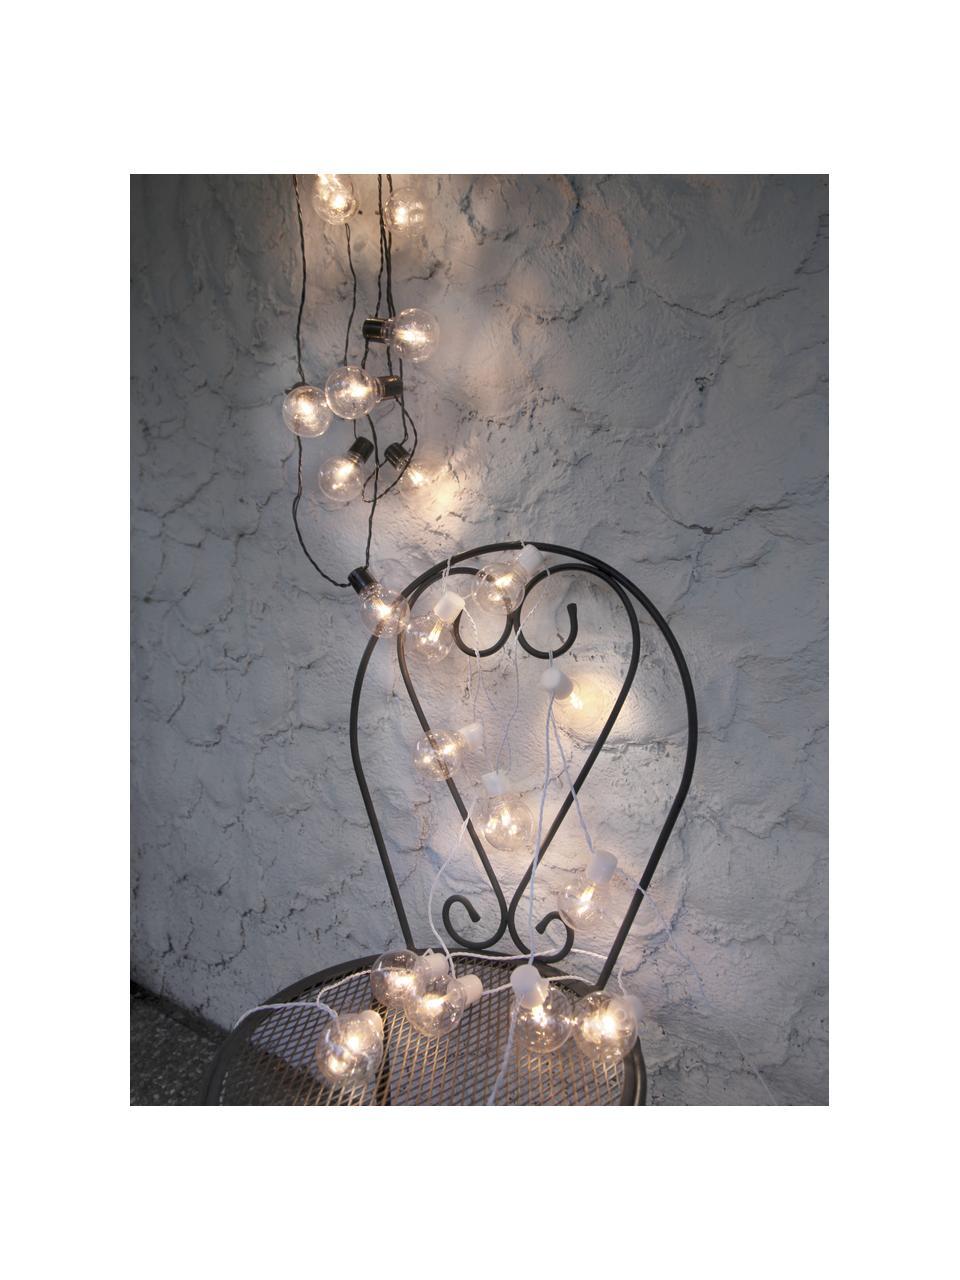 Ghirlanda a LED da esterno Partaj, 950 cm, 16 lampioni, Nero, Lung. 950 cm